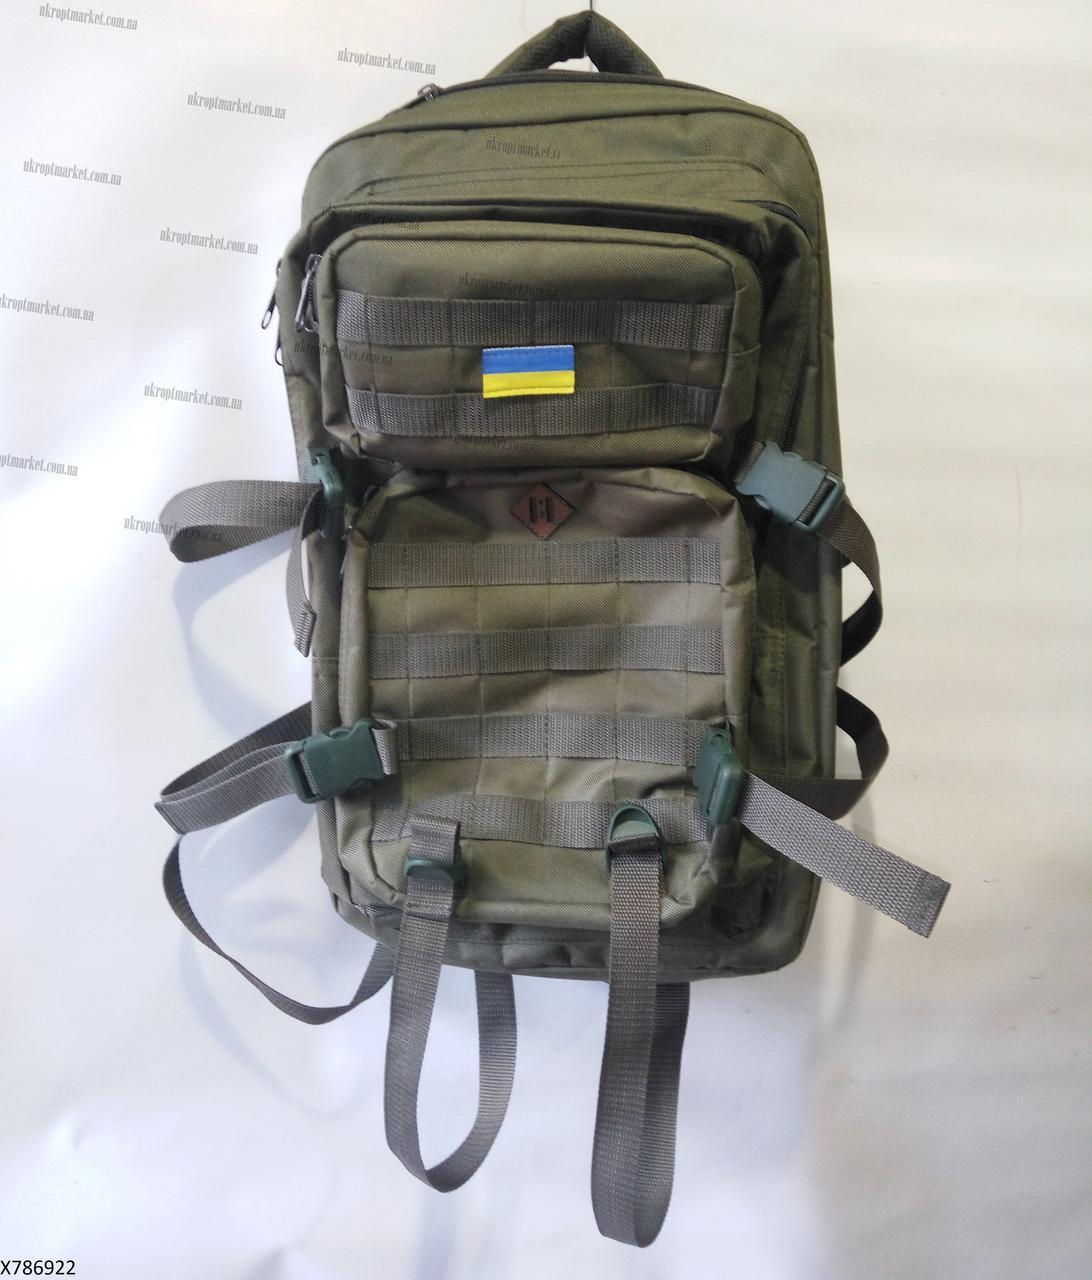 "Рюкзак тактический (45 л, олива) ""Pit"" купить оптом со склада LM-958"